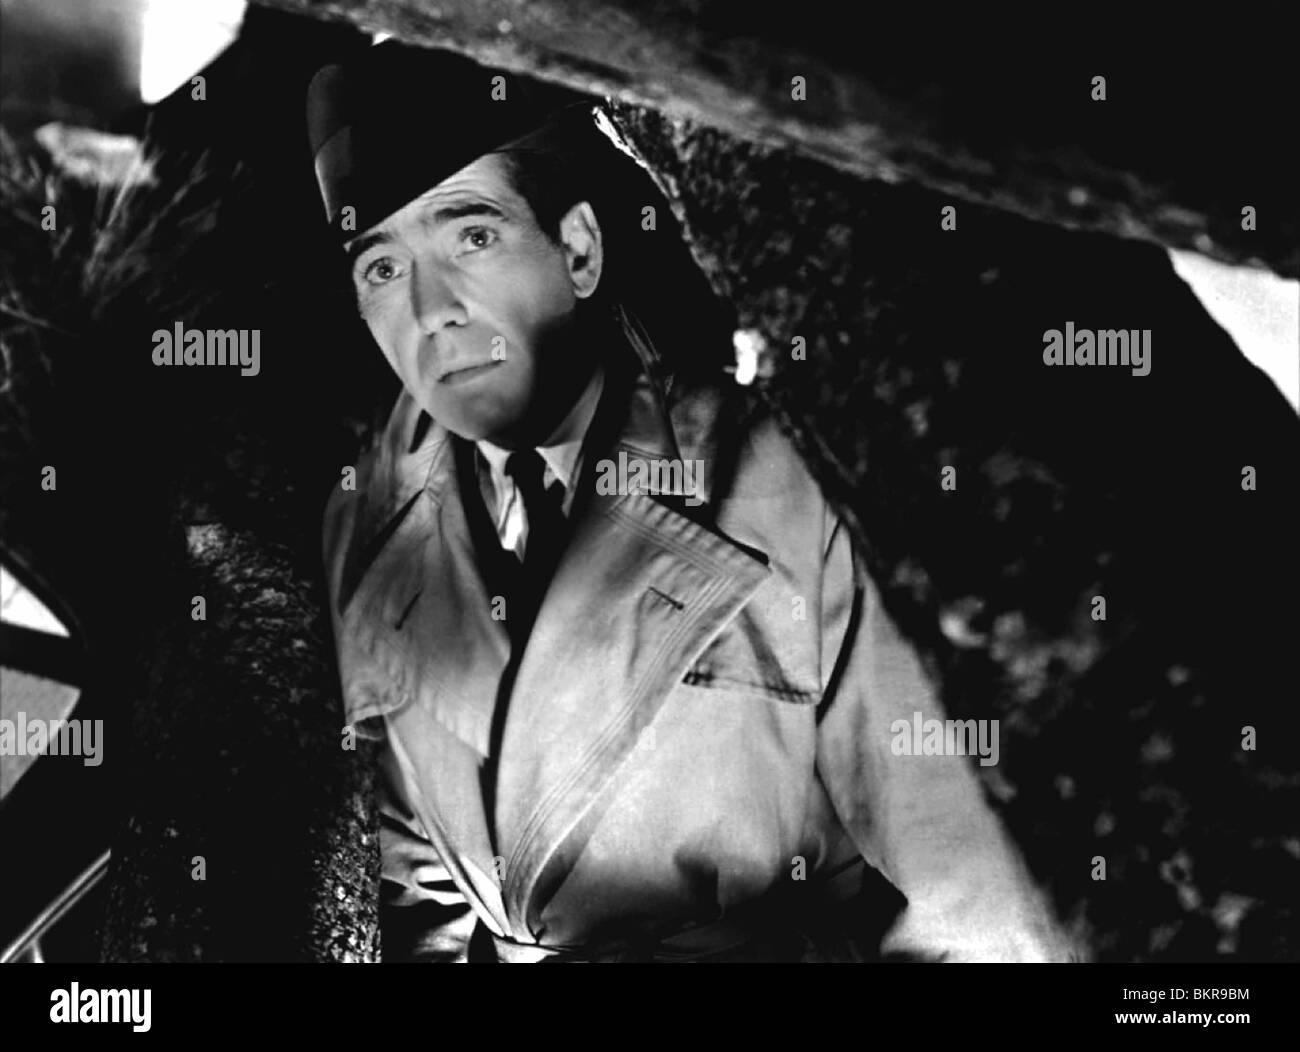 CONFLICT (1945) HUMPHREY BOGART, CURTIS BERNHARDT (DIR) CFLT 005 - Stock Image